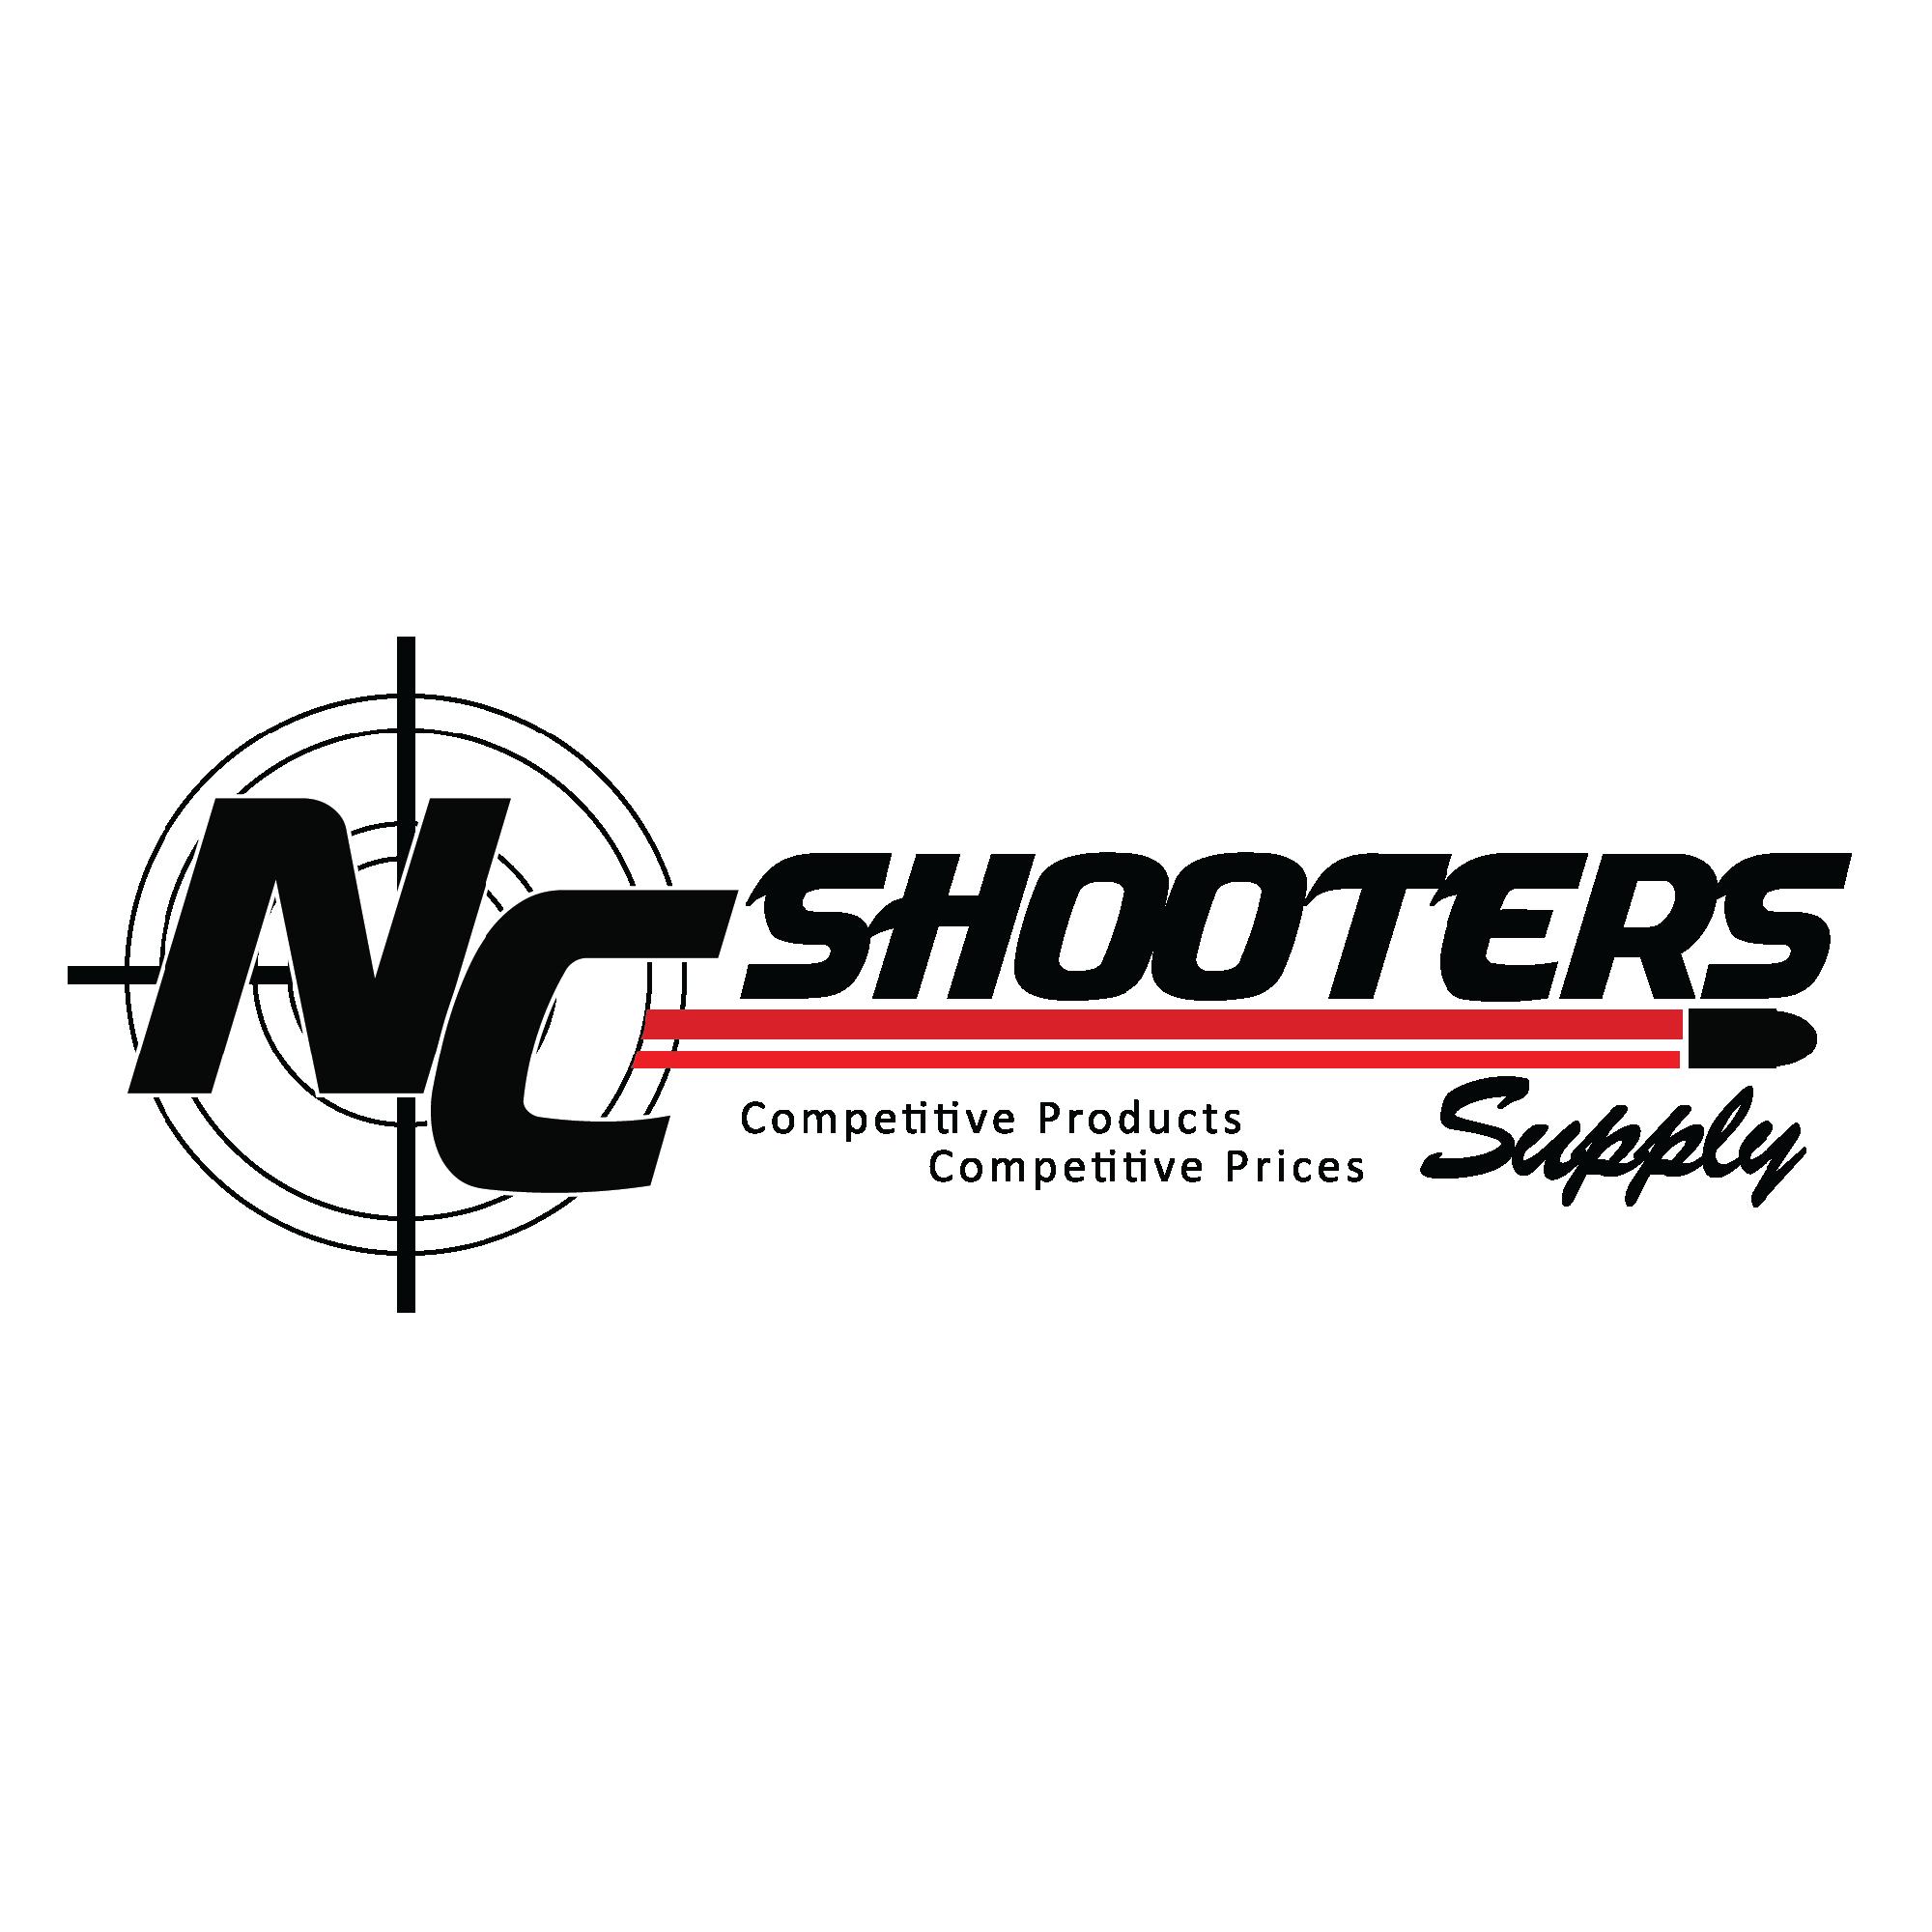 NCShooters Supply